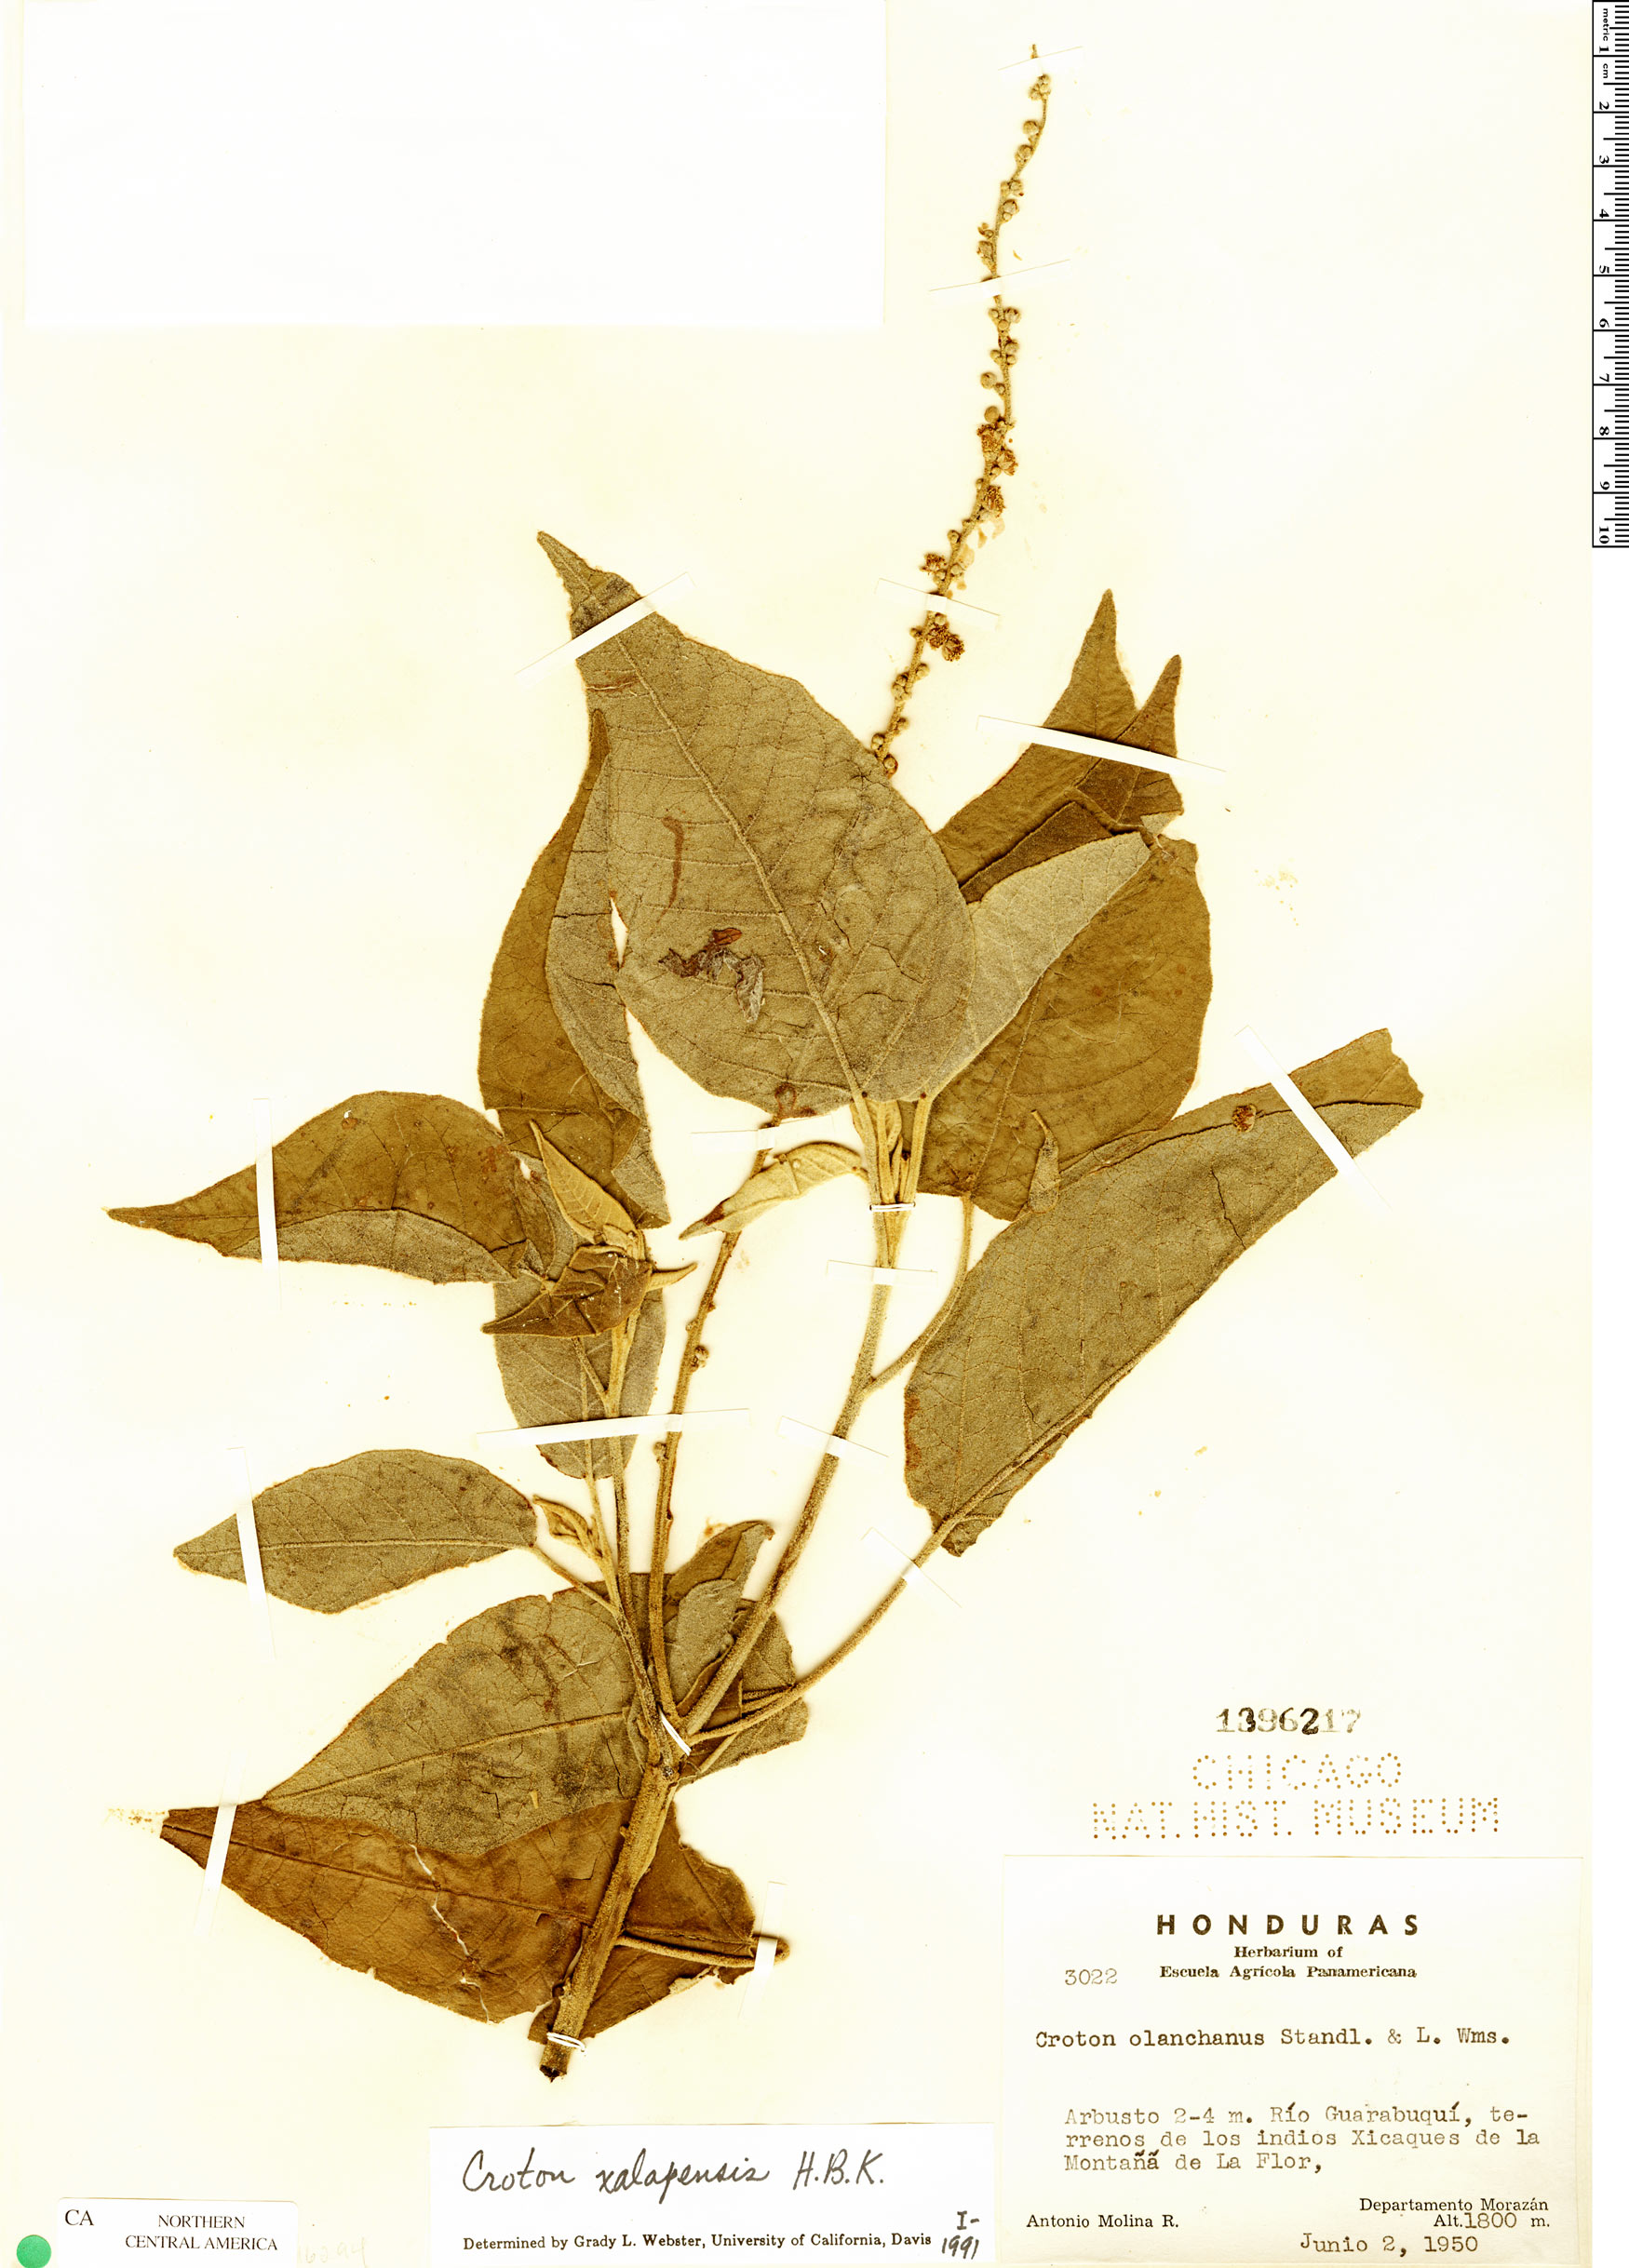 Specimen: Croton xalapensis